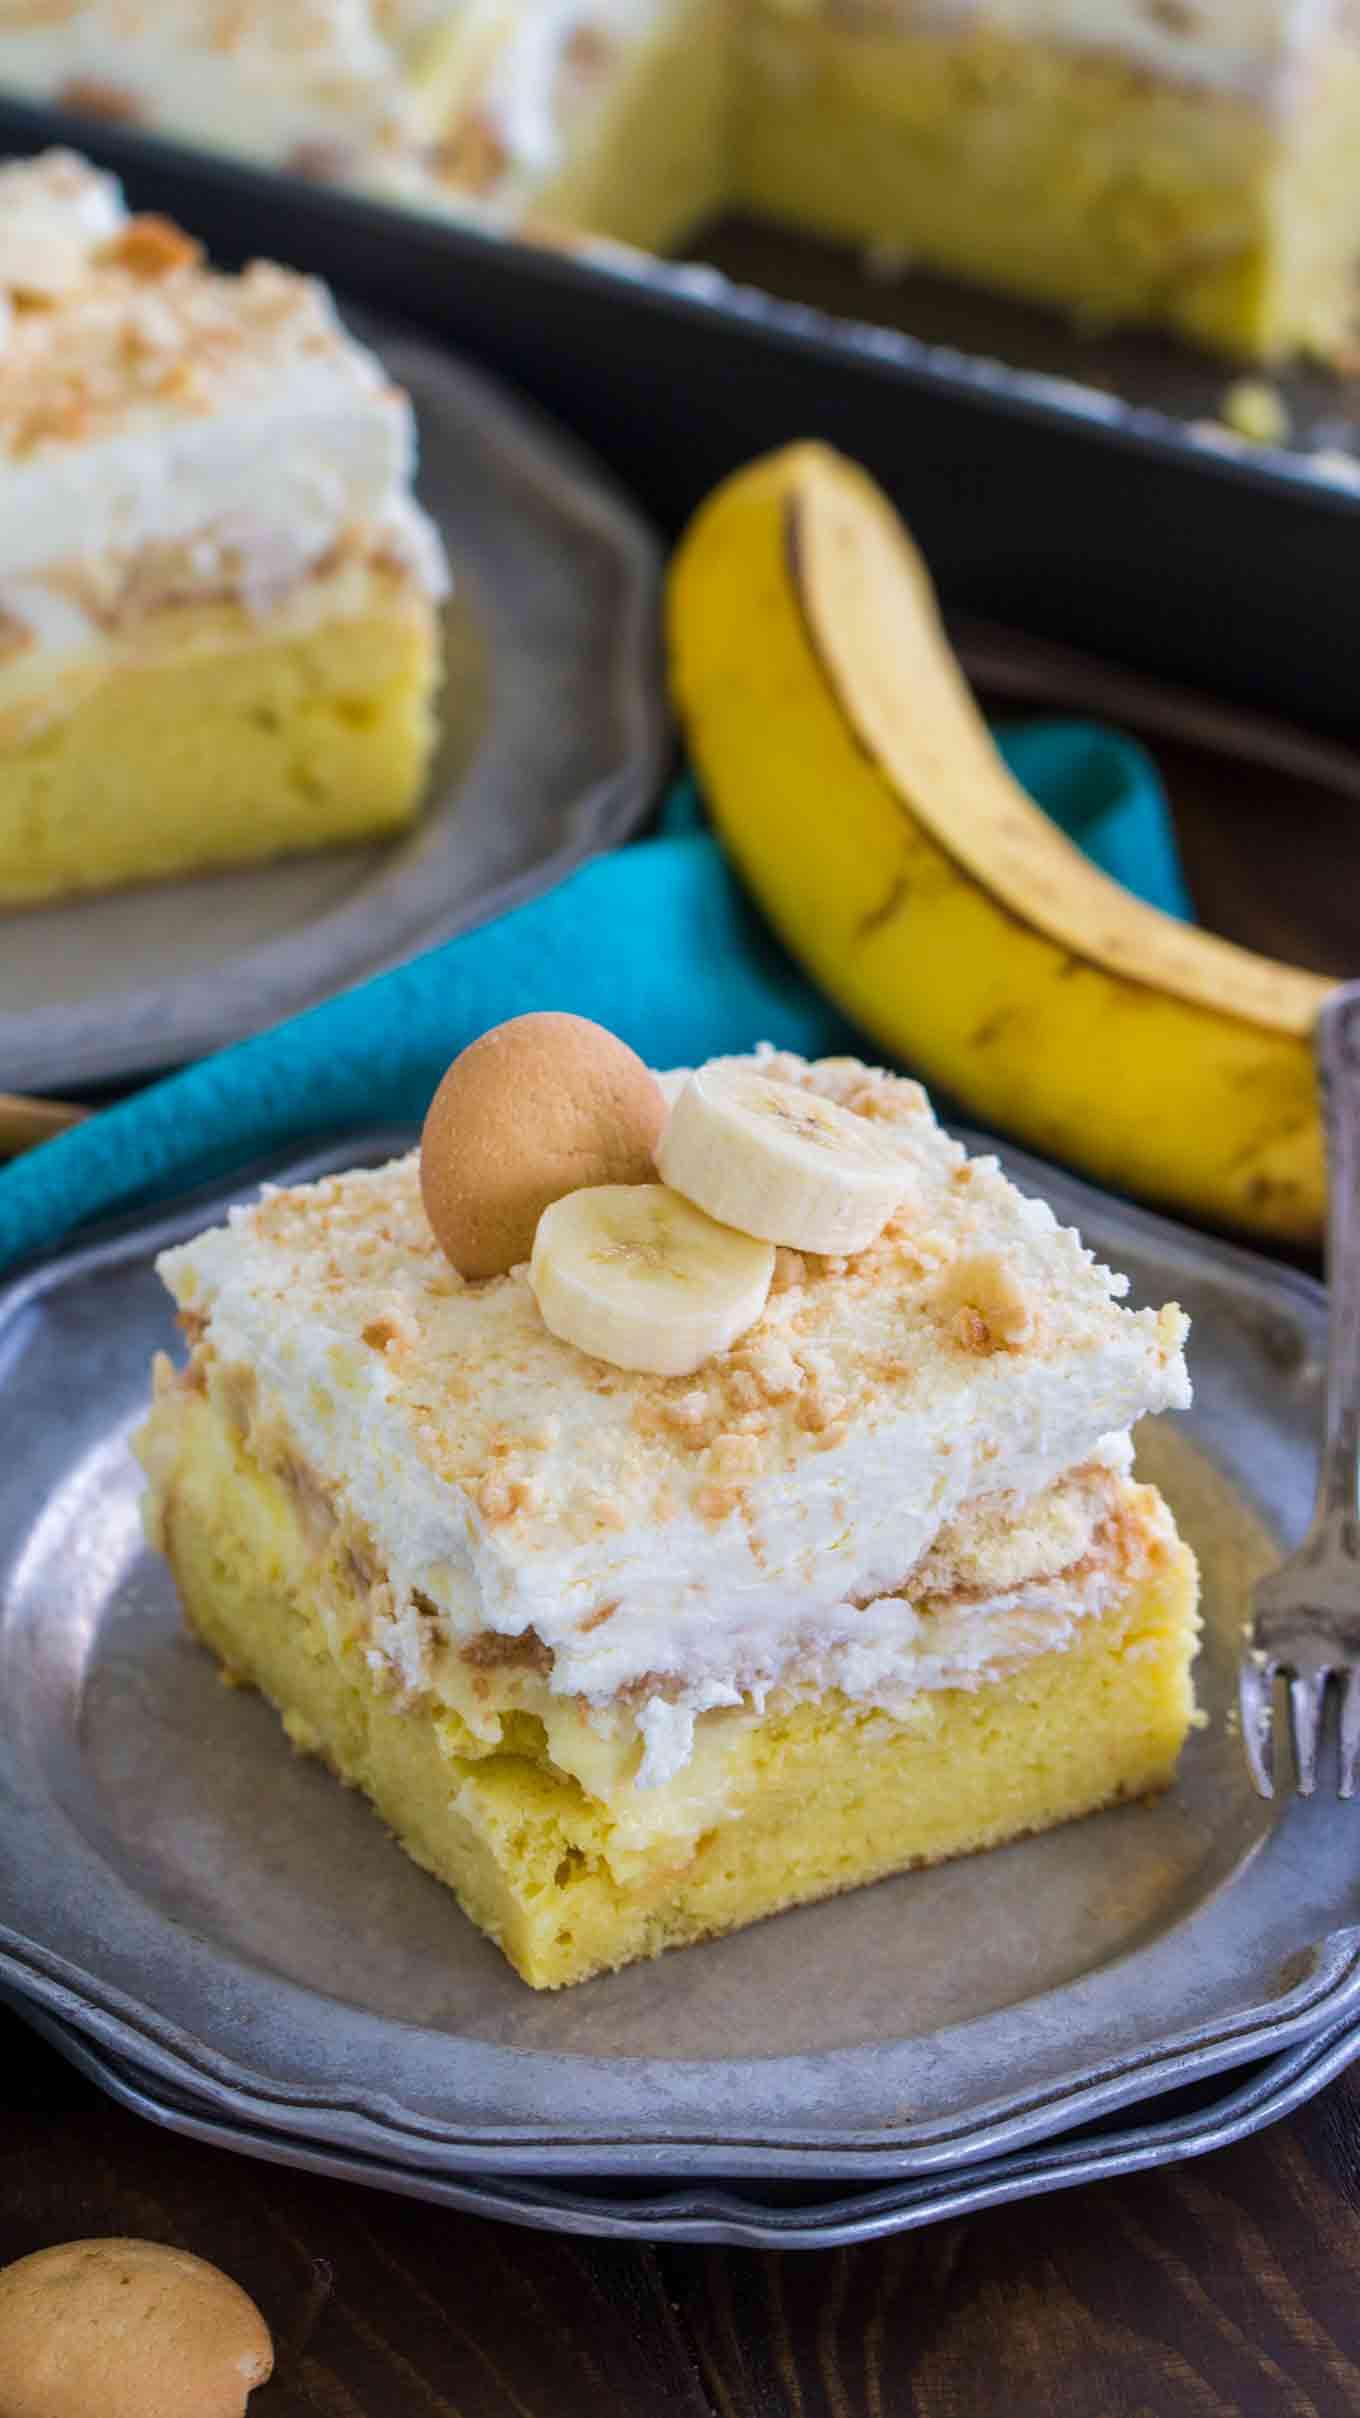 Banana Poke Cake  Banana Pudding Poke Cake Sweet and Savory Meals